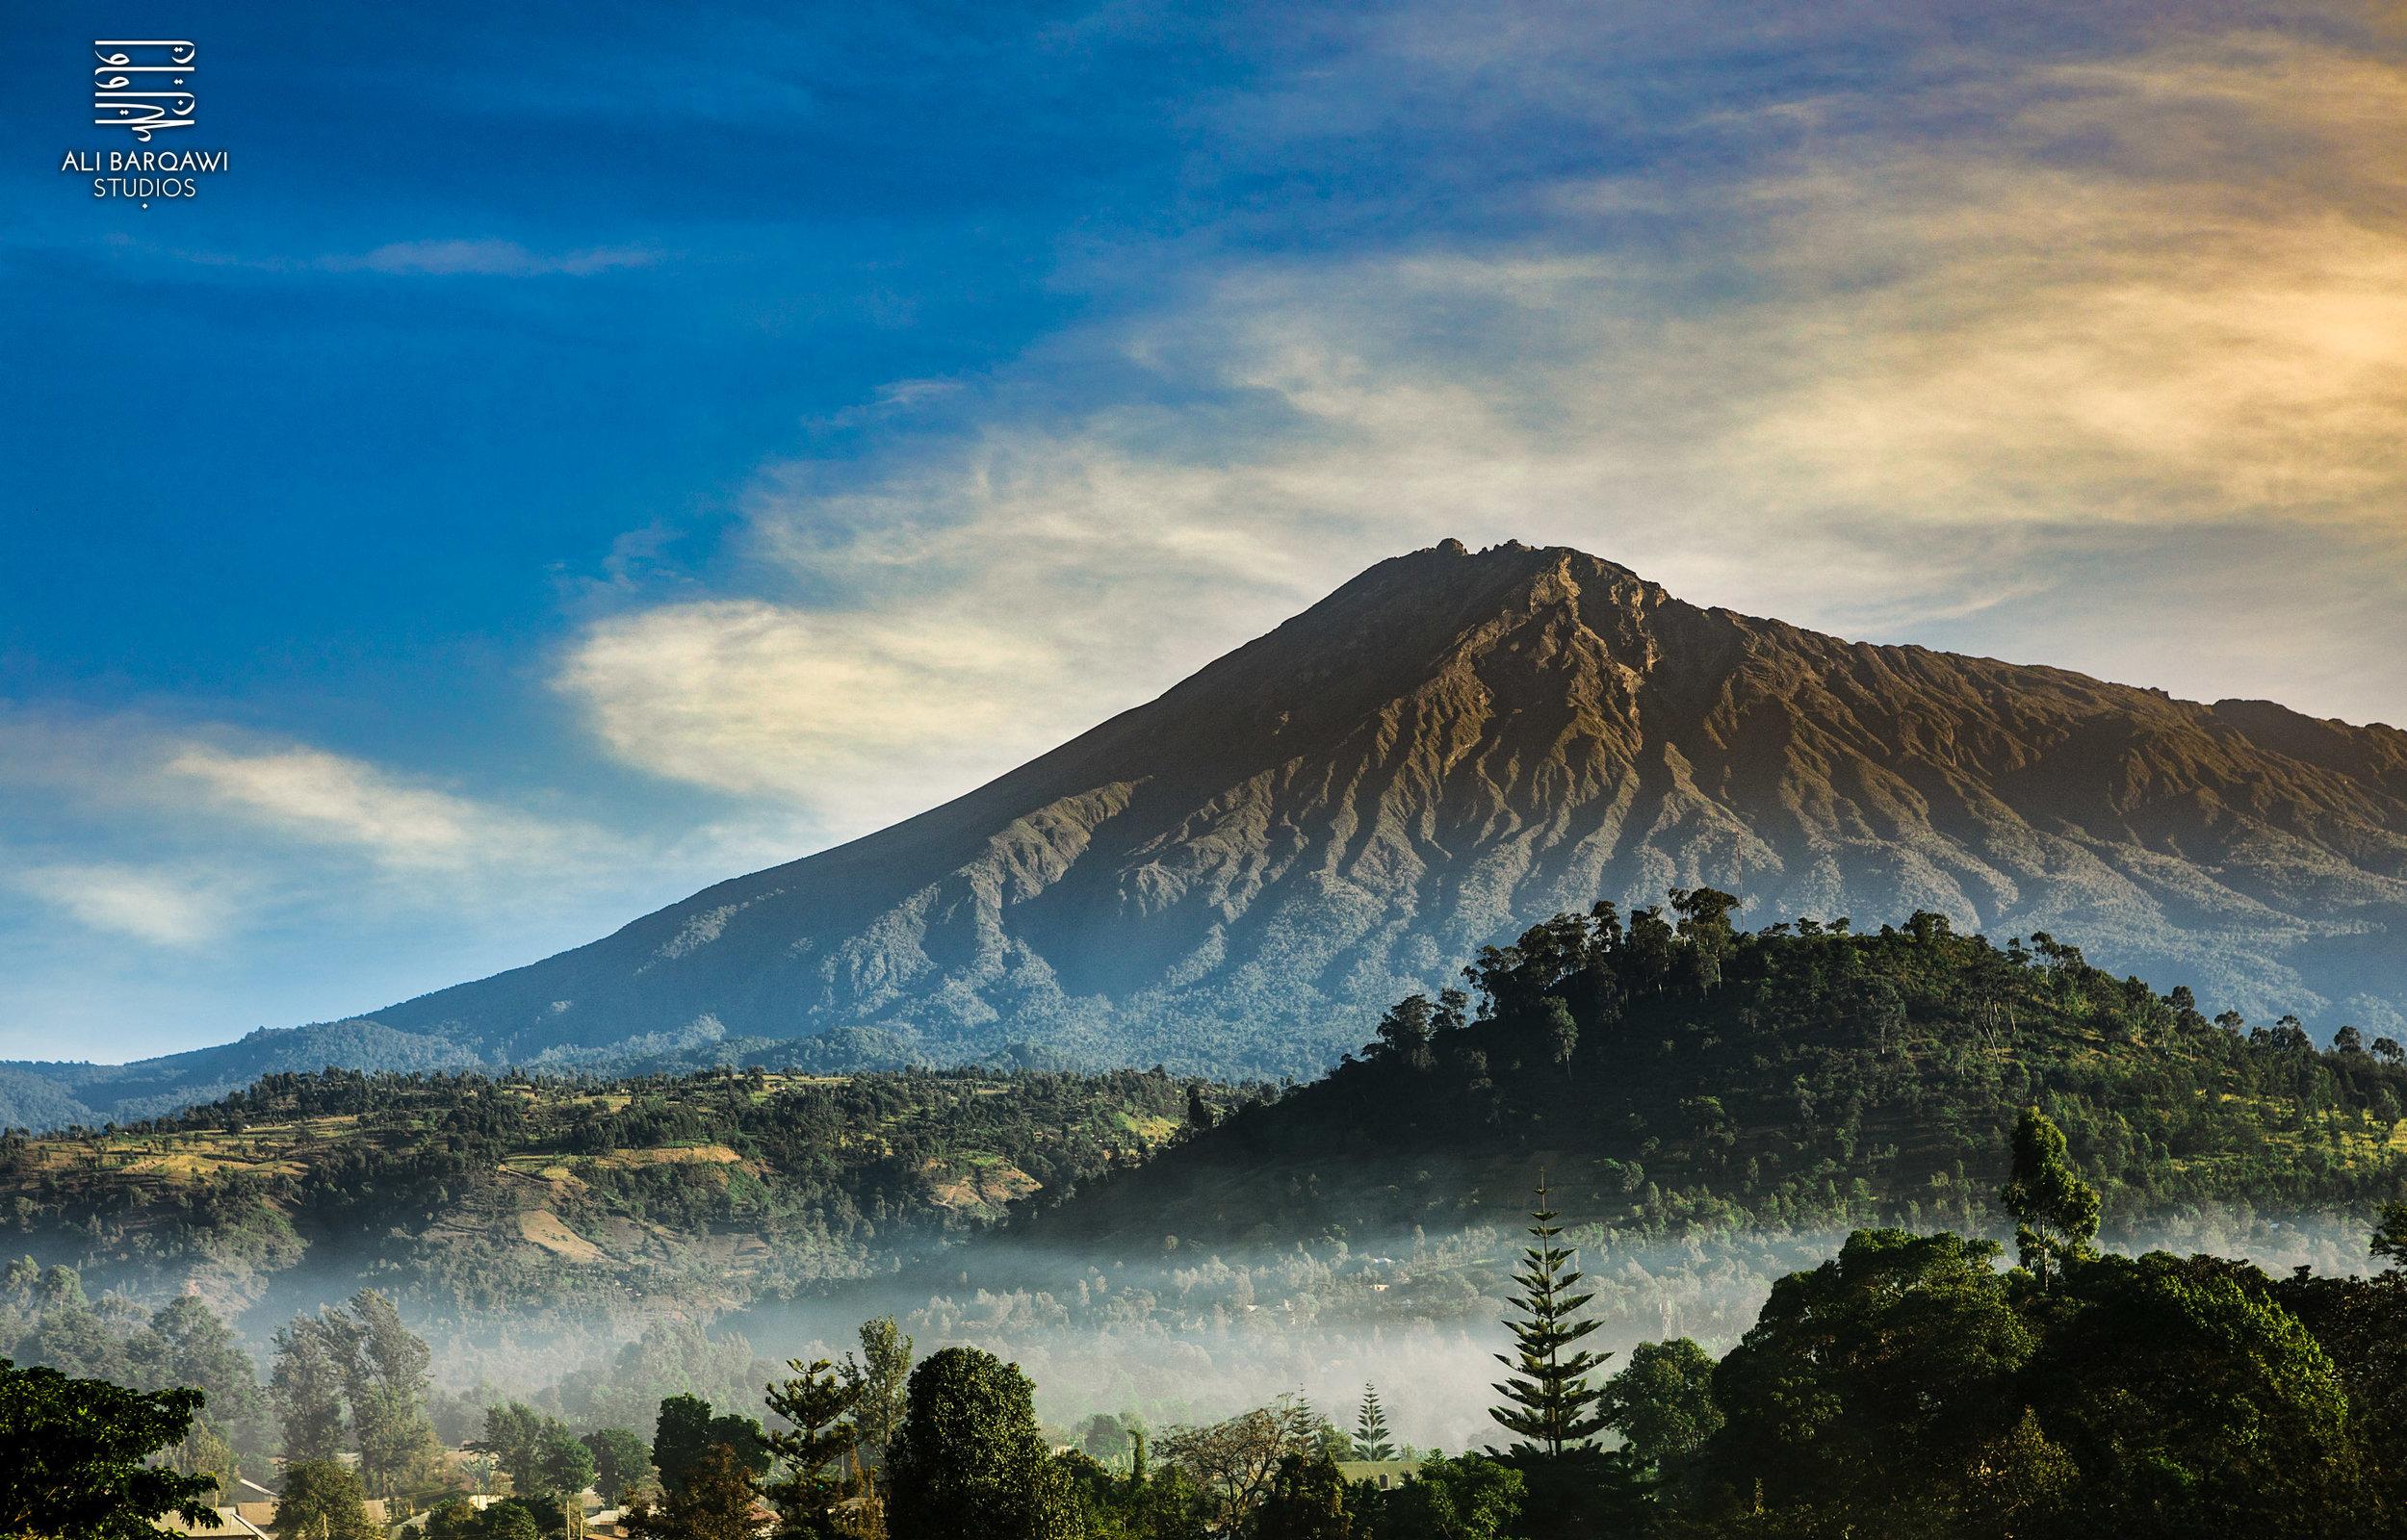 Ali-Barqawi-Studios-Explore-Series-Travel-Adventure-Documentary-Climb4Karam-Kilimanjaro-Tanzania-2017-008.jpg